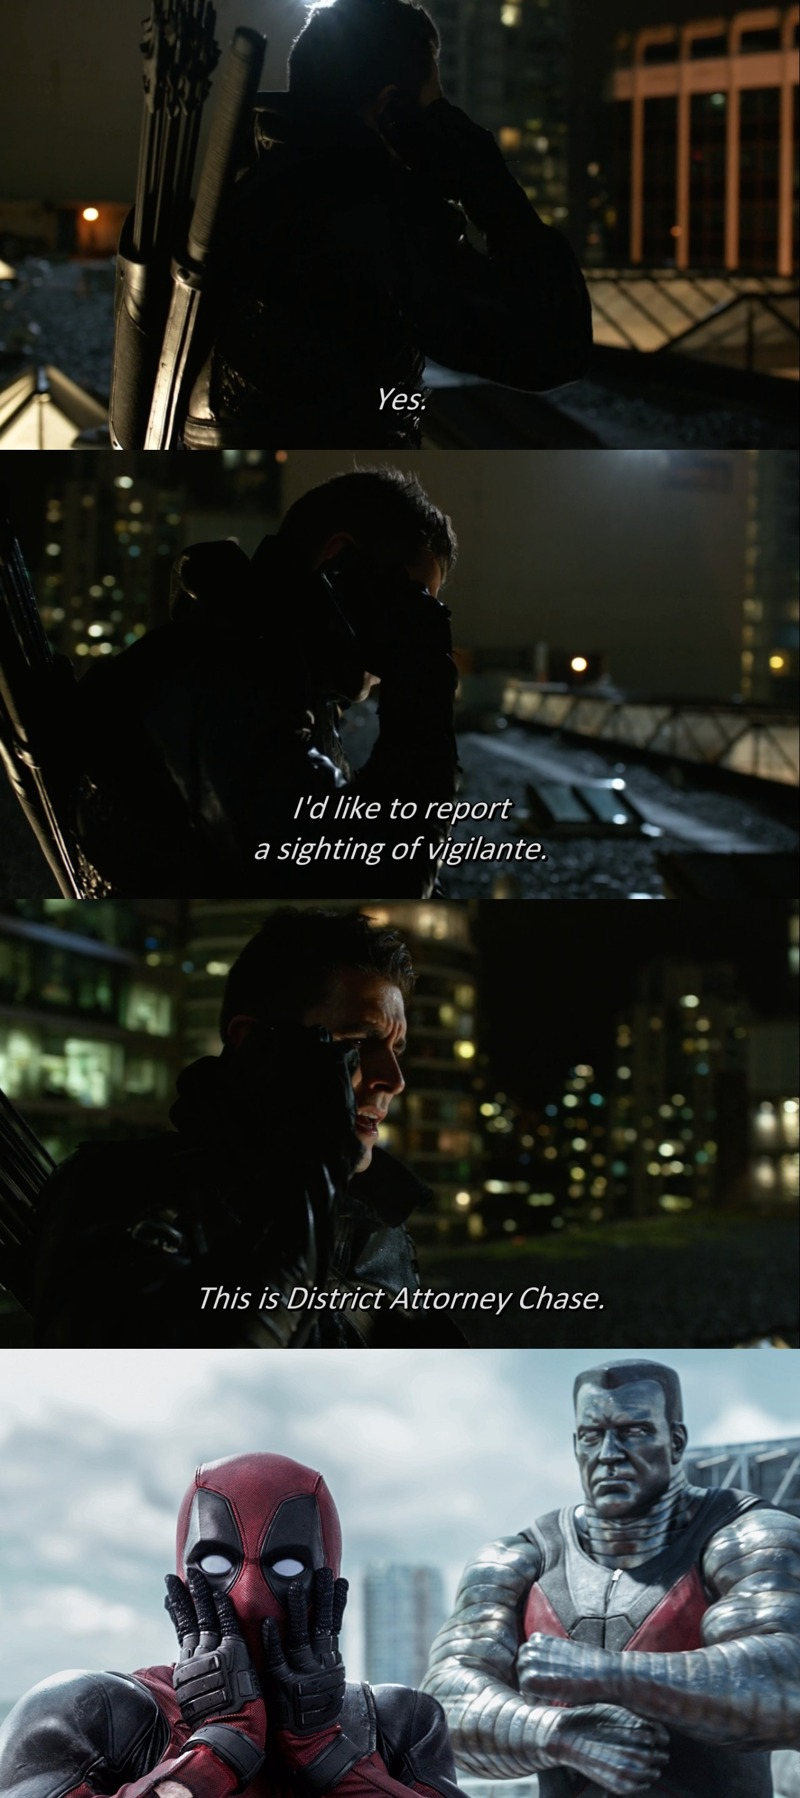 What a plot twist!  Who's Vigilante?